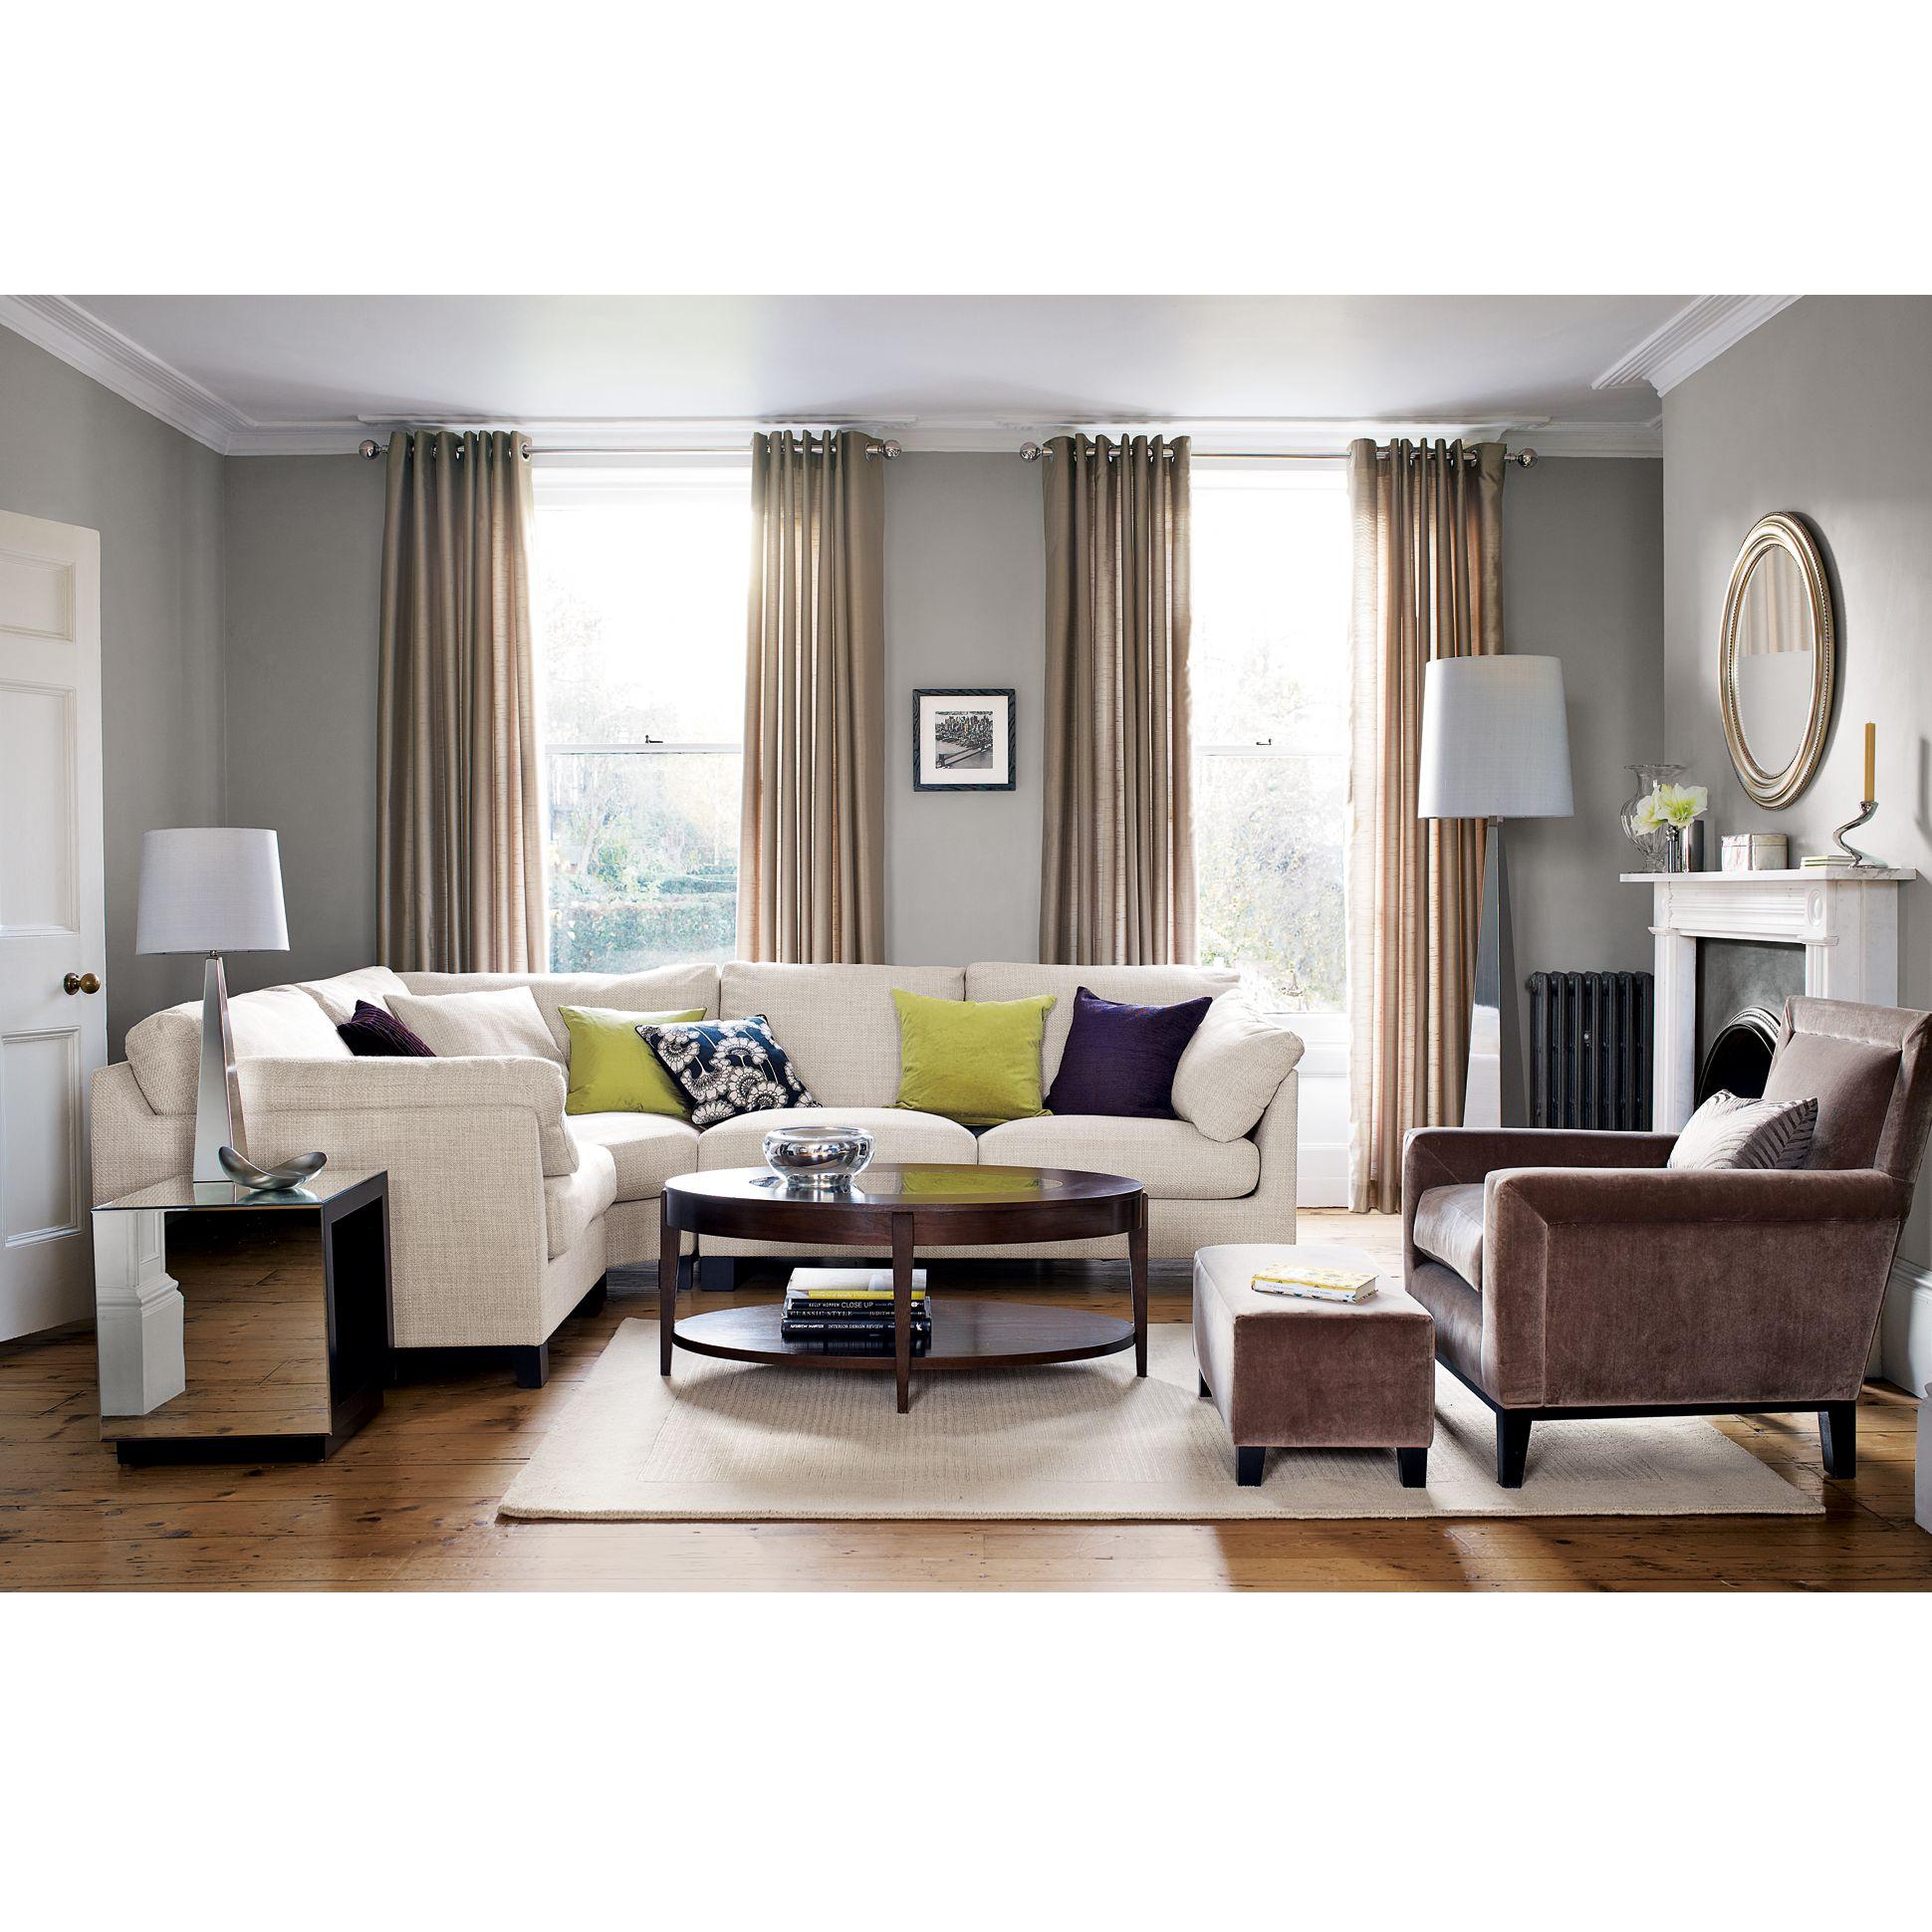 John lewis living room designs   Hawk Haven